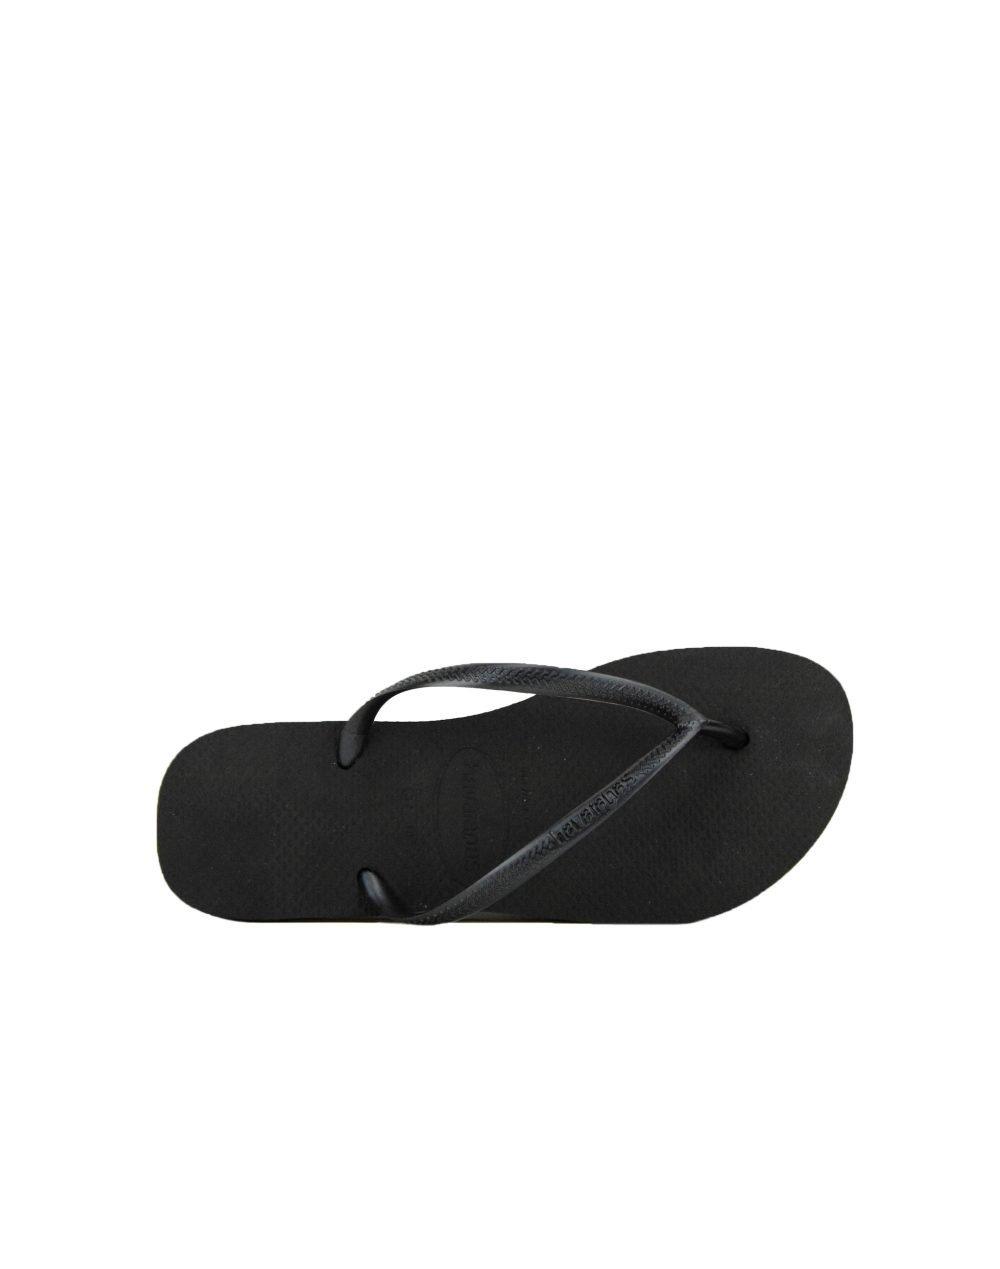 Havaianas Slim (4000030 0090) Black